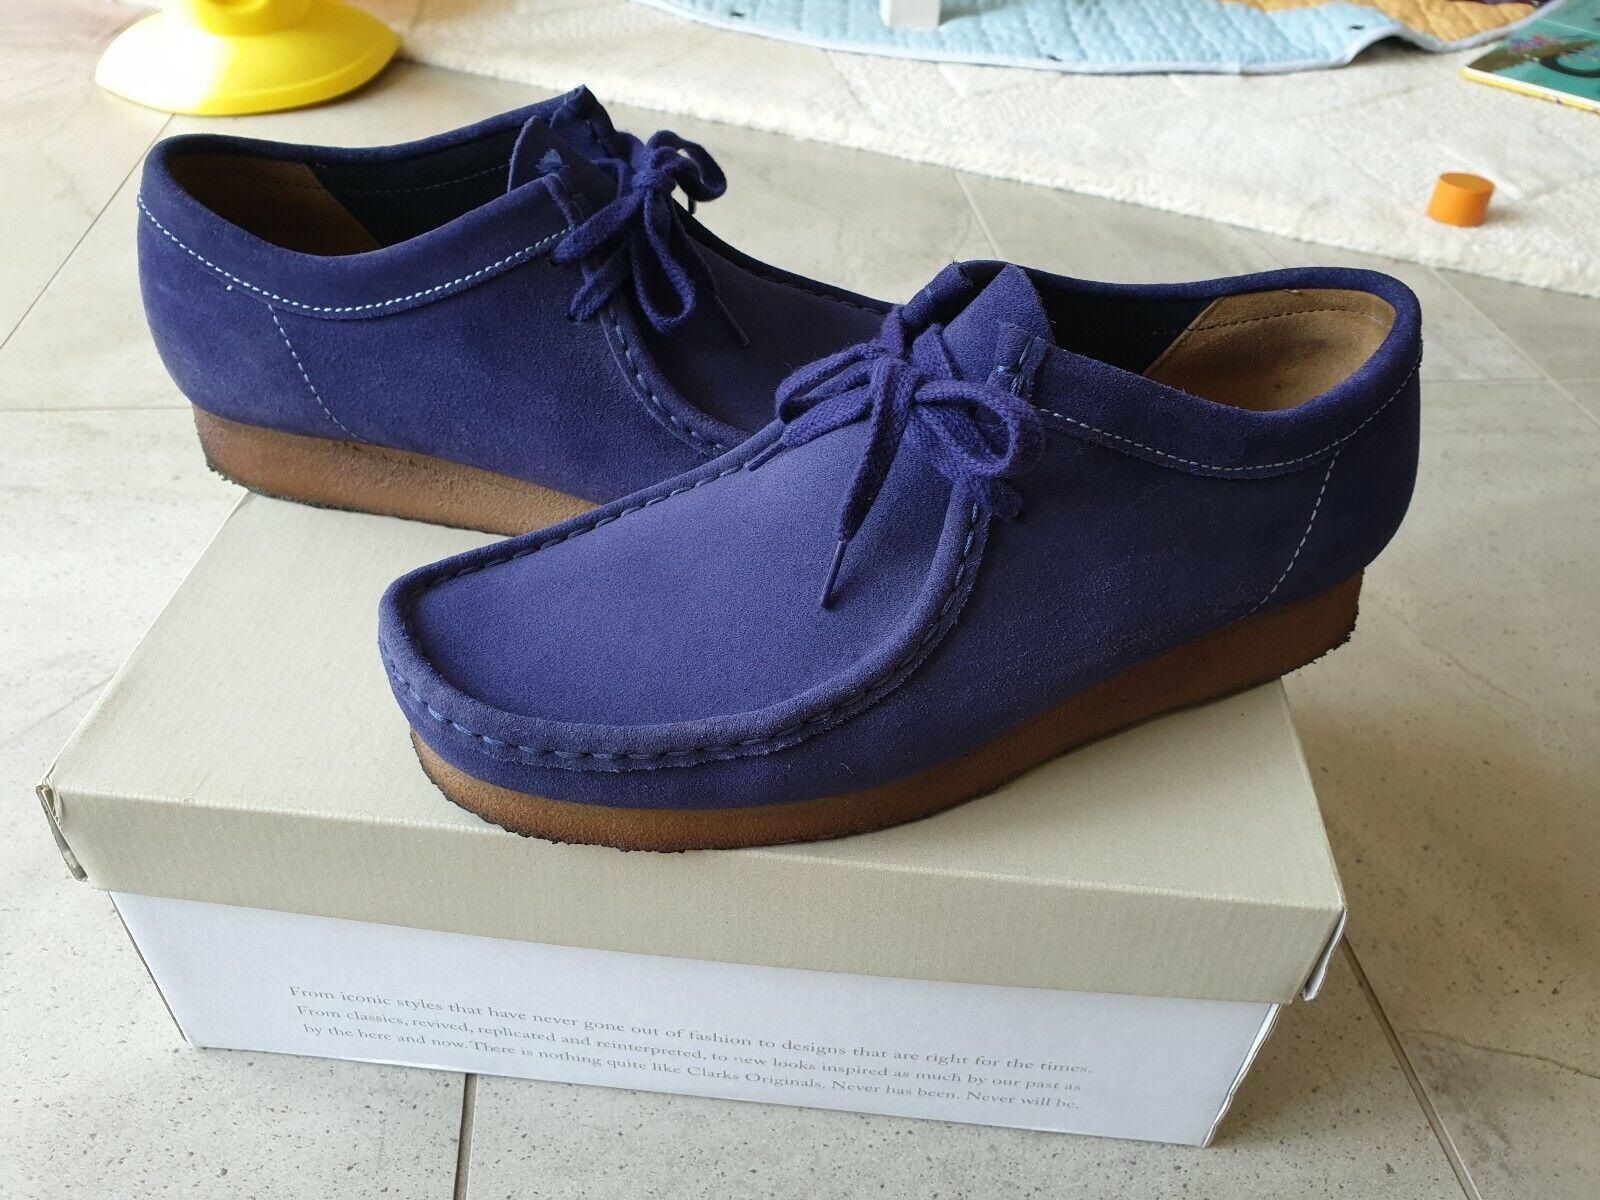 Clarks Wallabee boot desert 9.5 blue Suede Leather Desert brown 9 8 purple